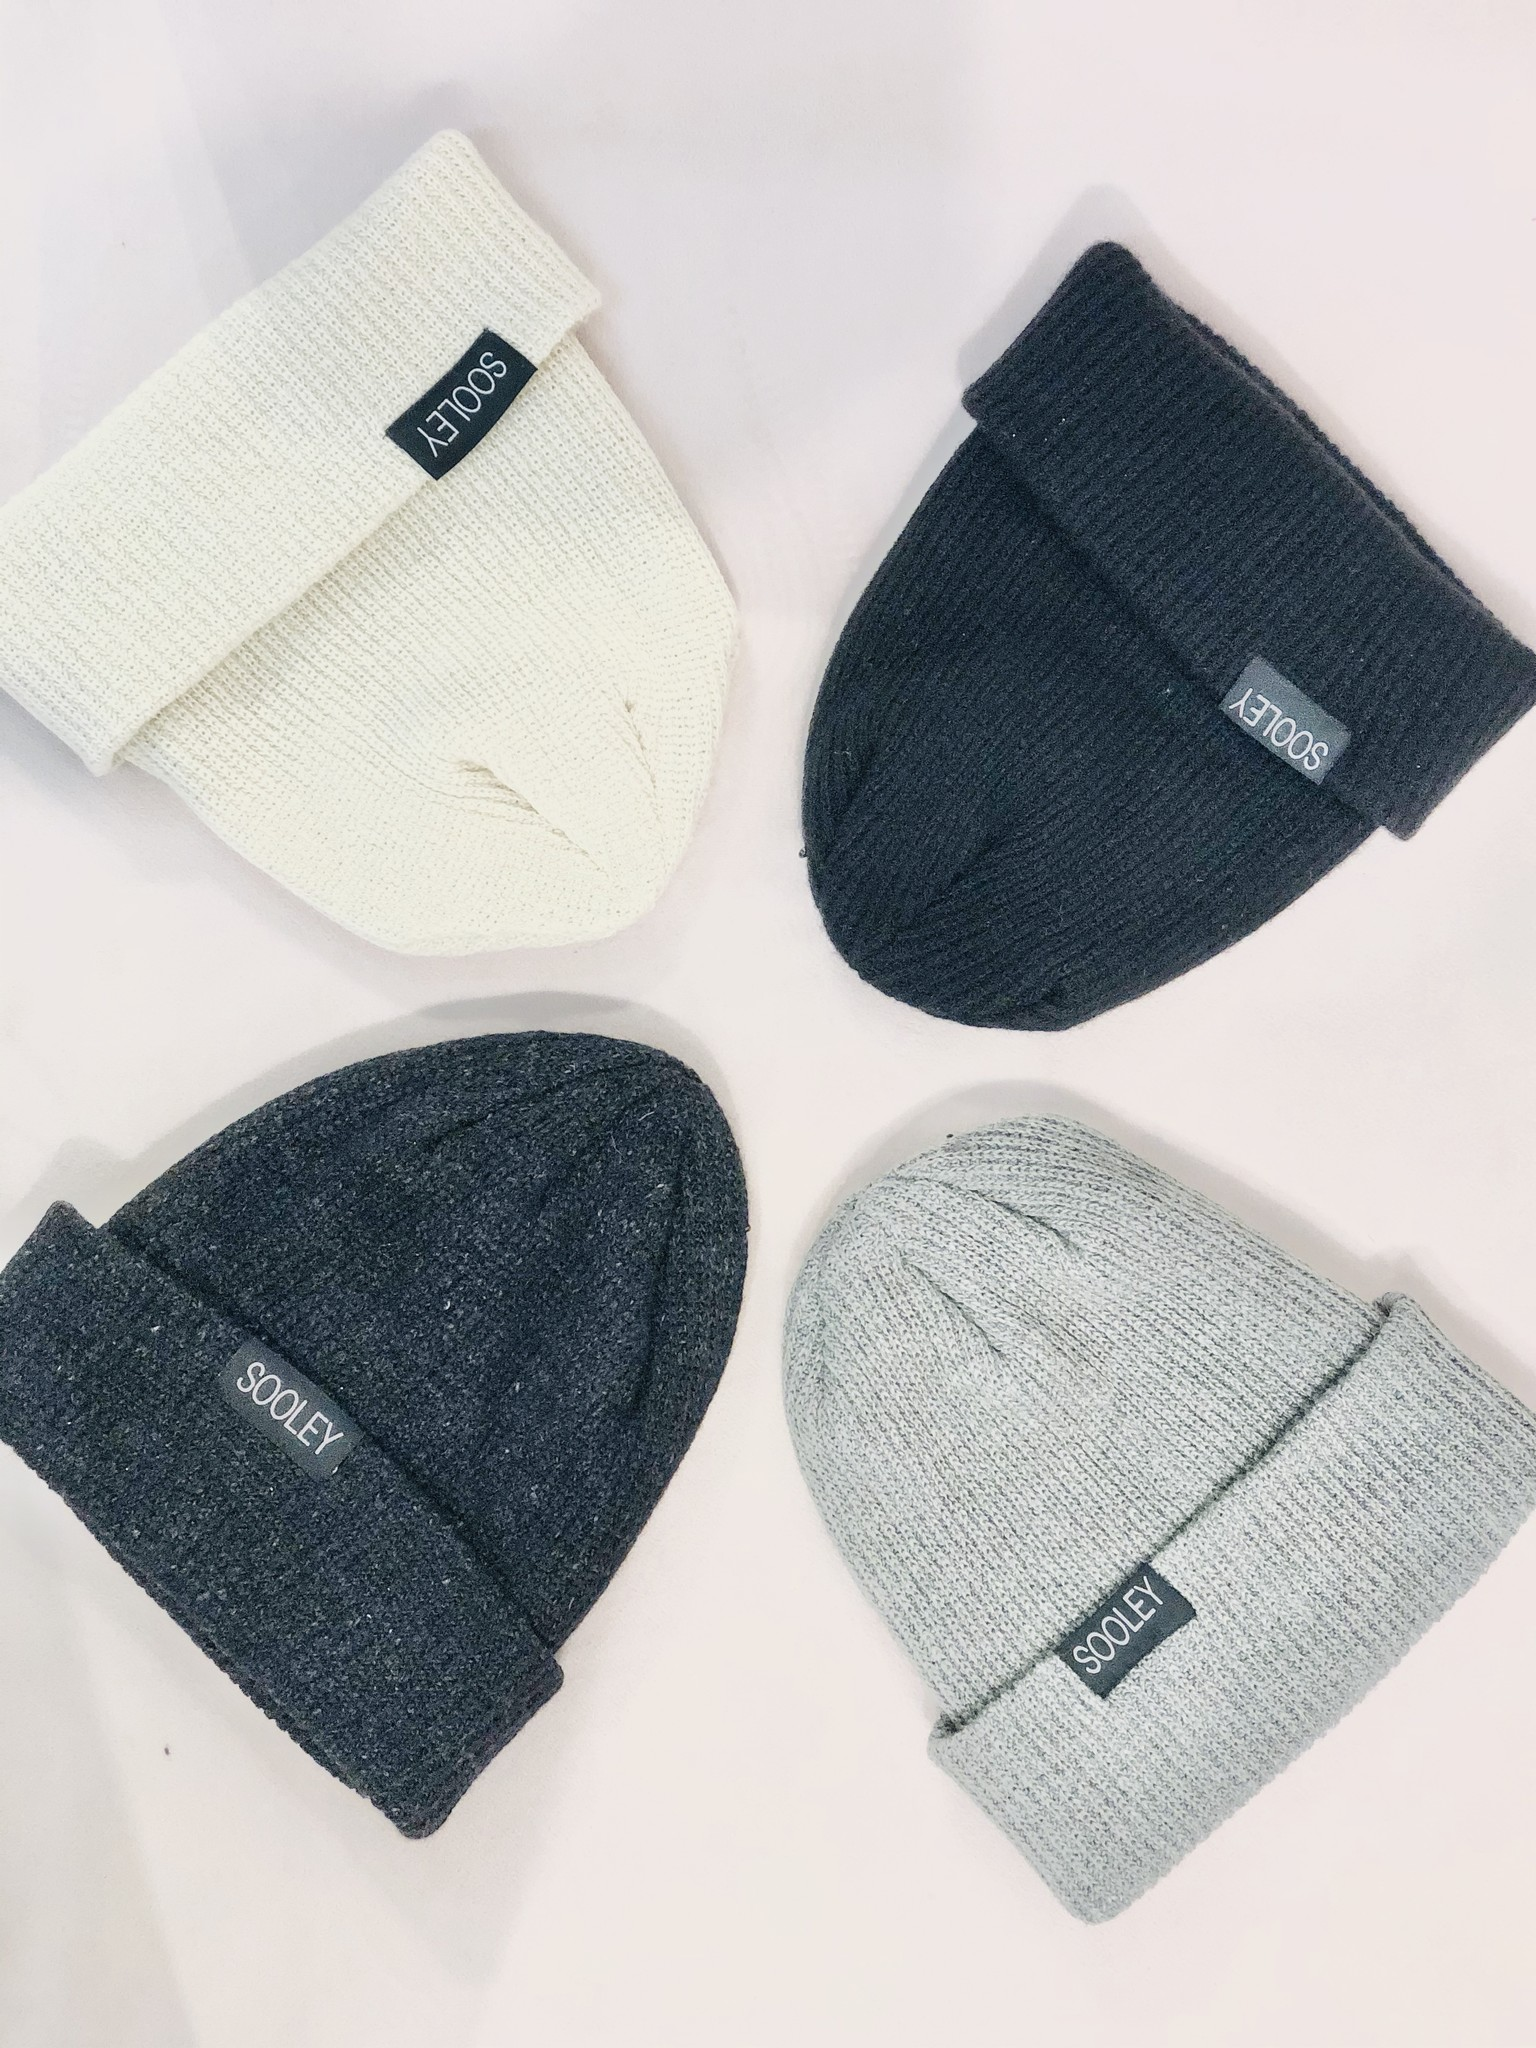 Sooley Designs Cashmere Hat